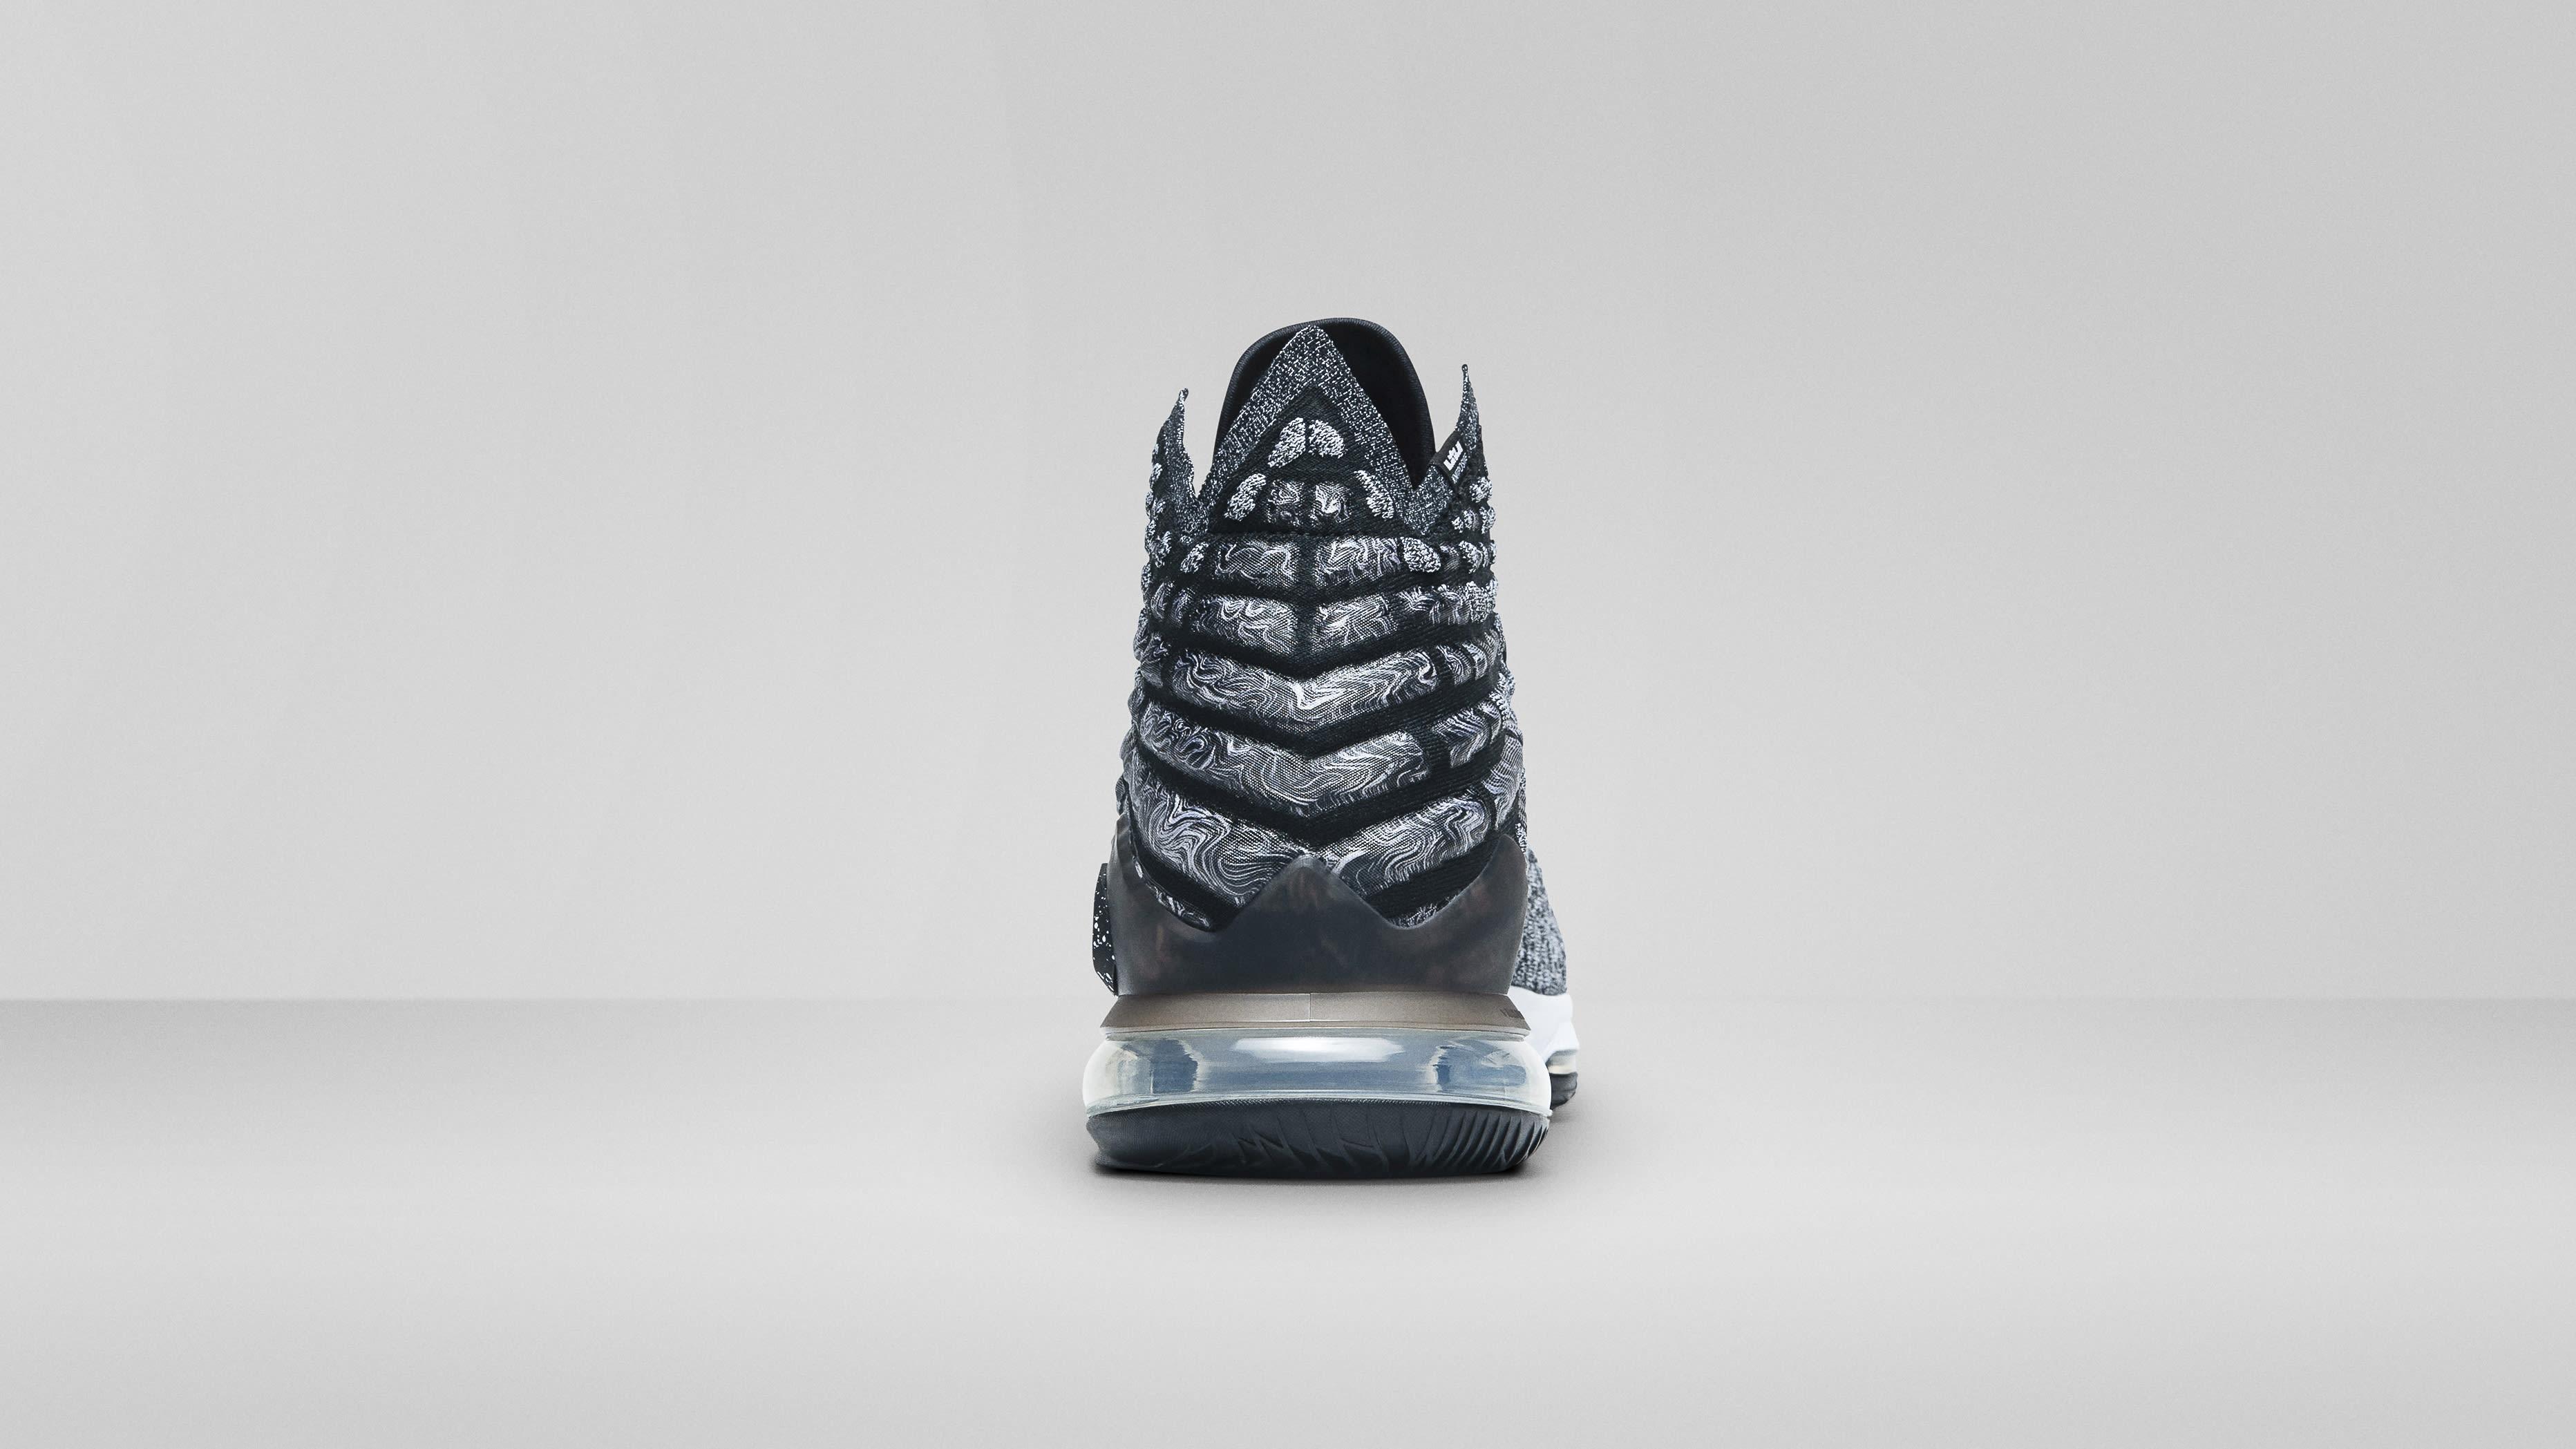 Nike LeBron 17 'Black/White' (Heel)